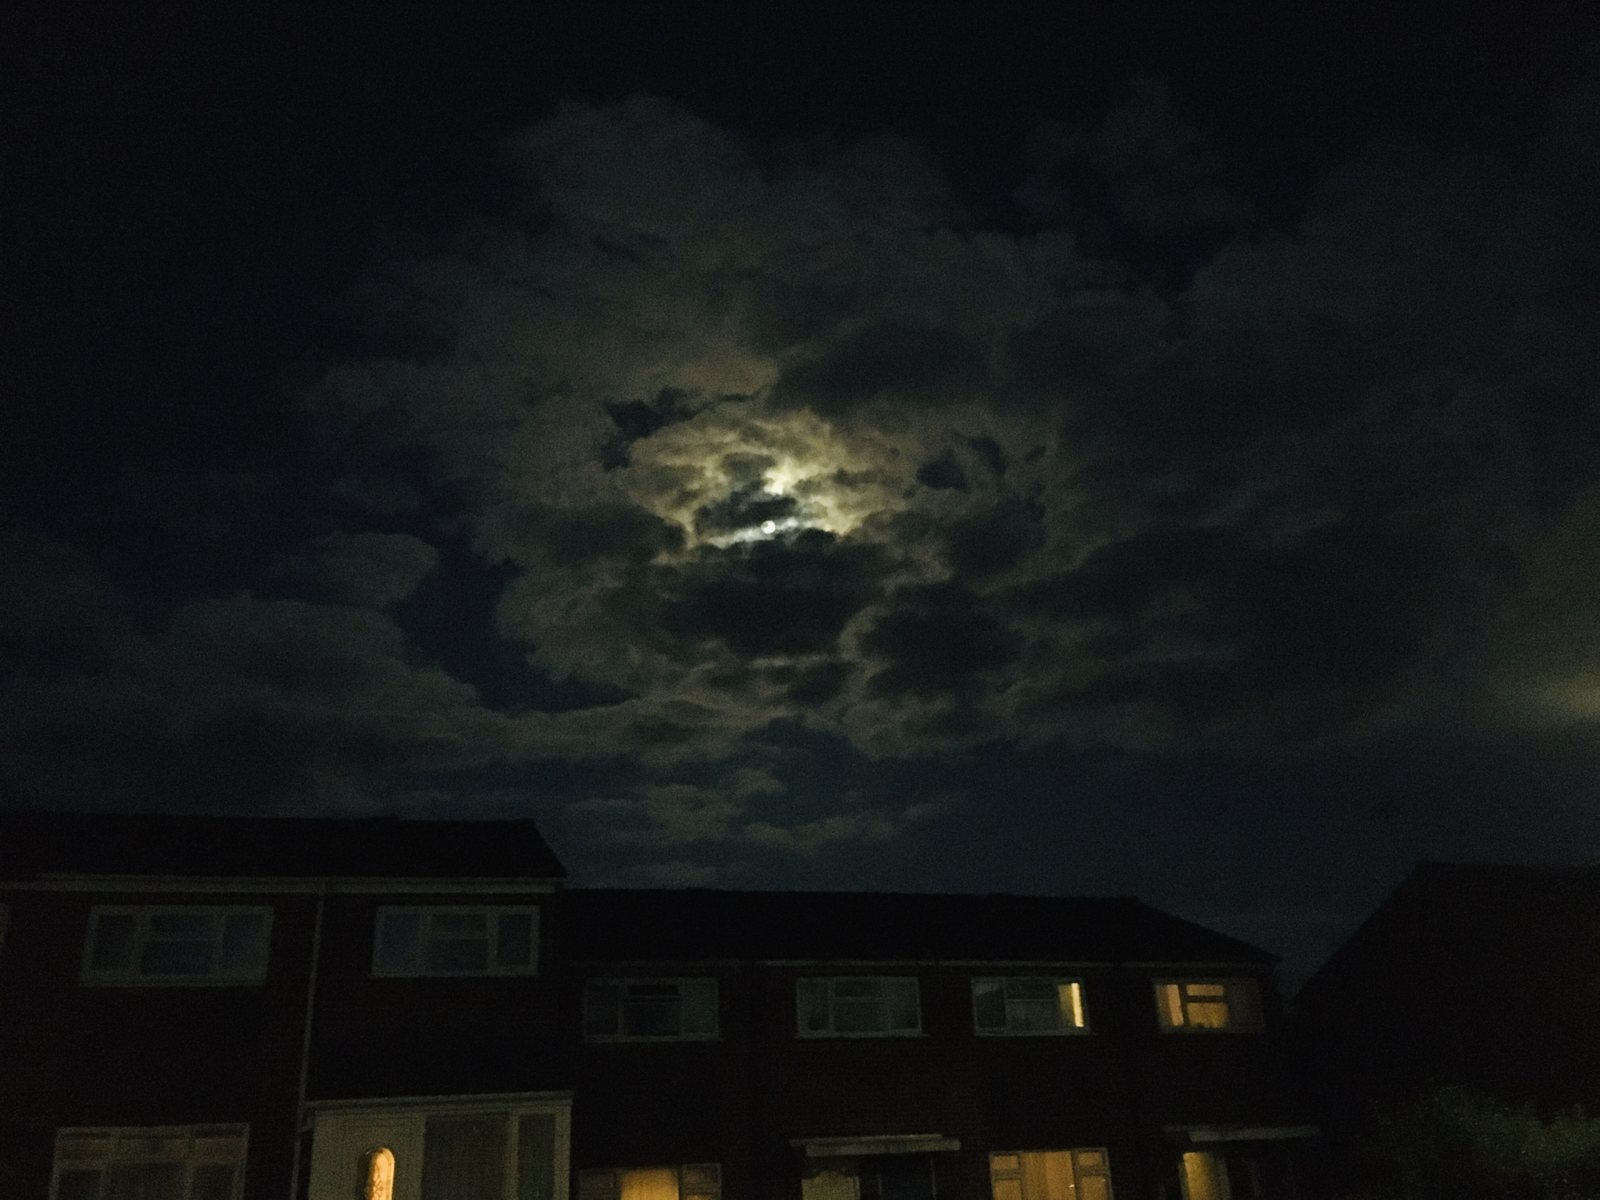 Covid-19 moon in lock-down mode